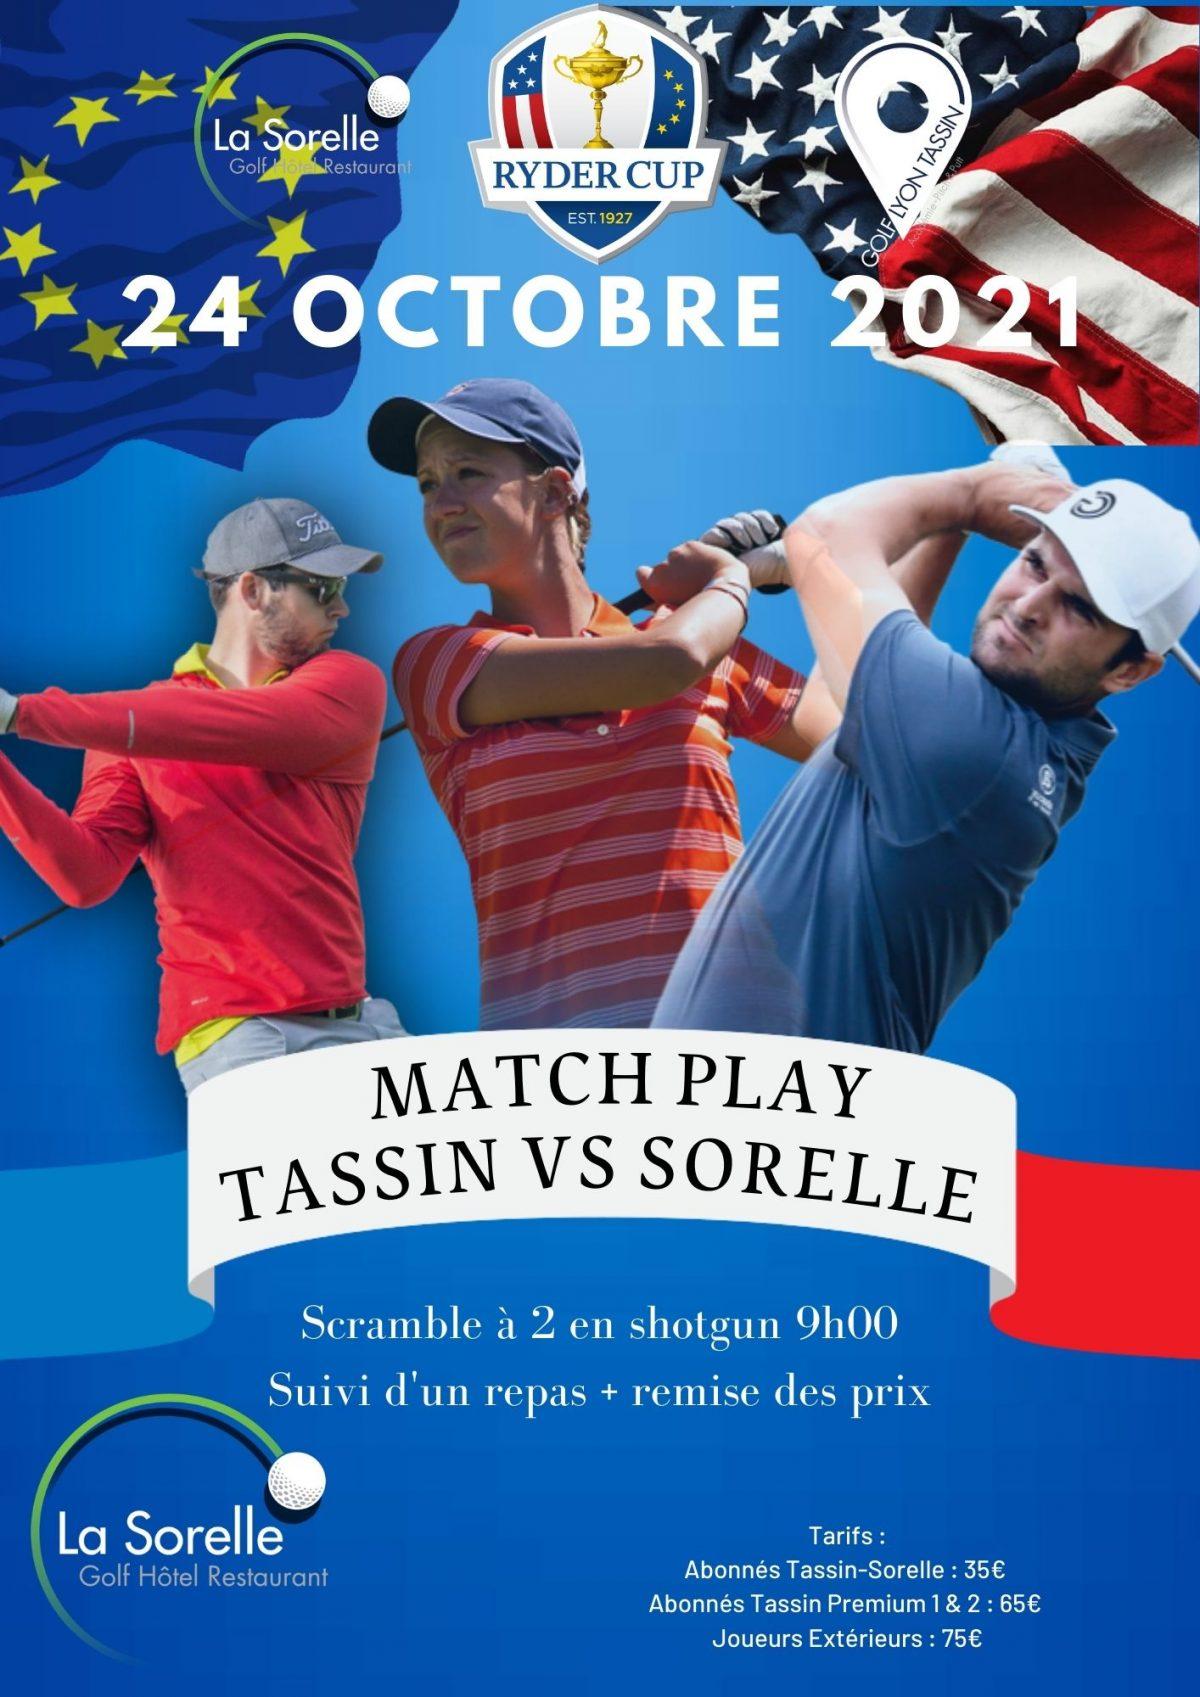 TASSIN VS LA SORELLE : RYDER CUP